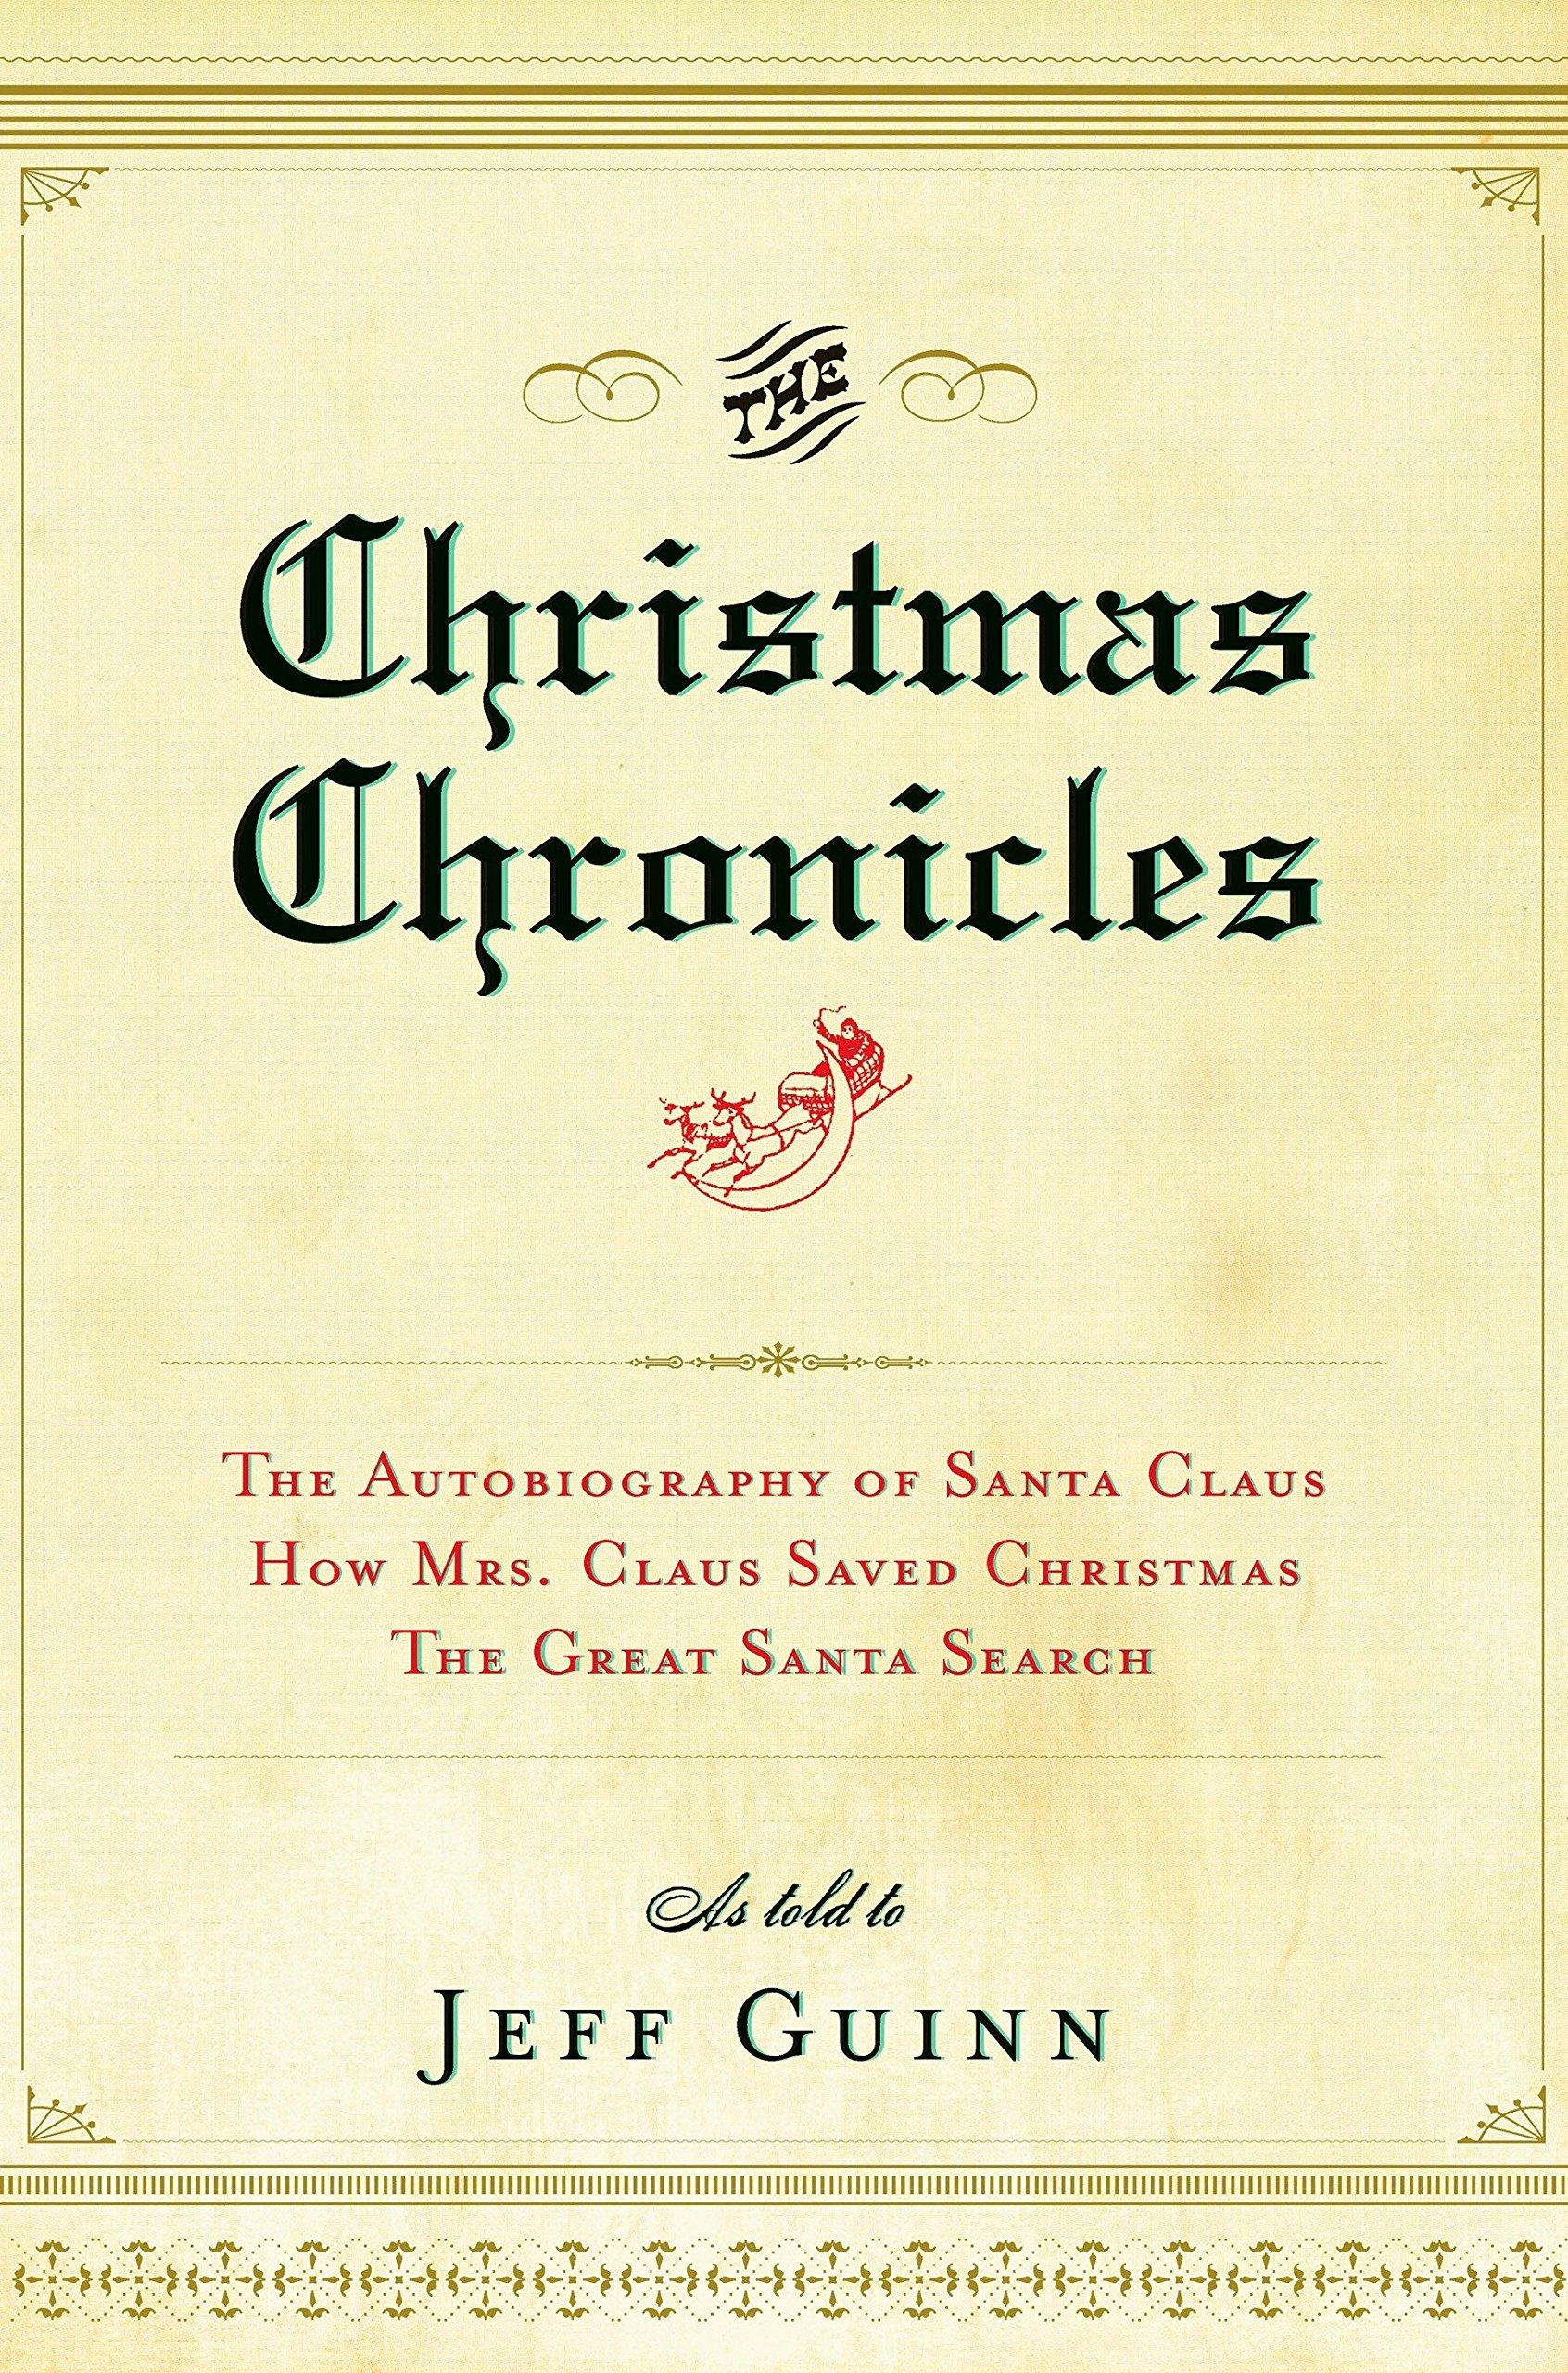 Christmas Chronicles Sleigh.The Christmas Chronicles Jeff Guinn 9781585426690 Amazon